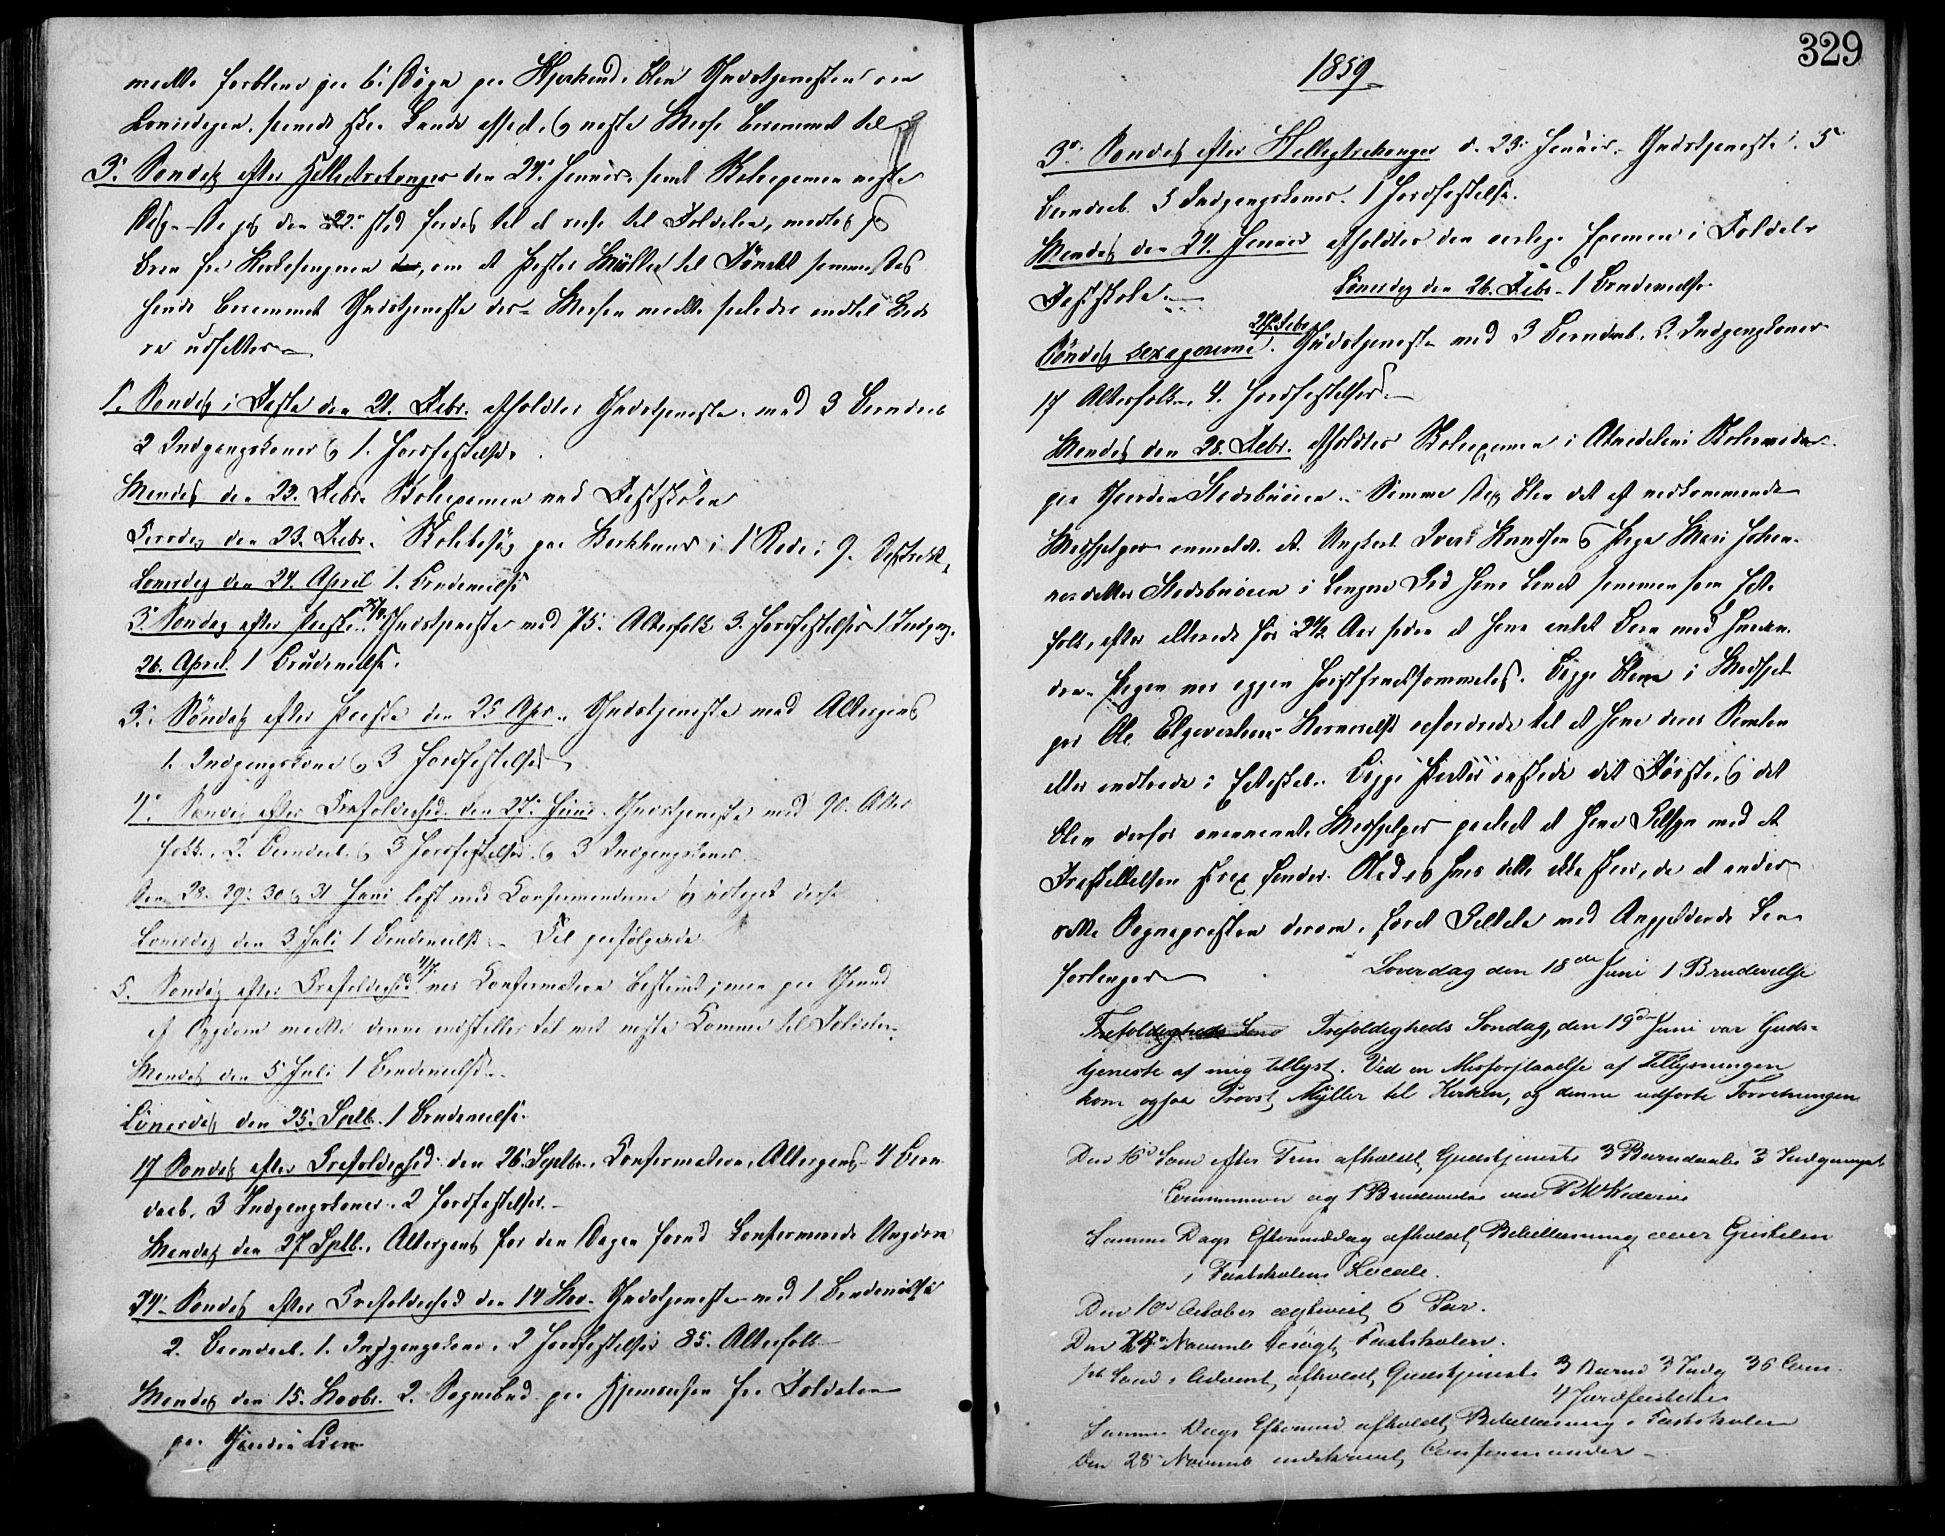 SAH, Lesja prestekontor, Ministerialbok nr. 7, 1854-1862, s. 329